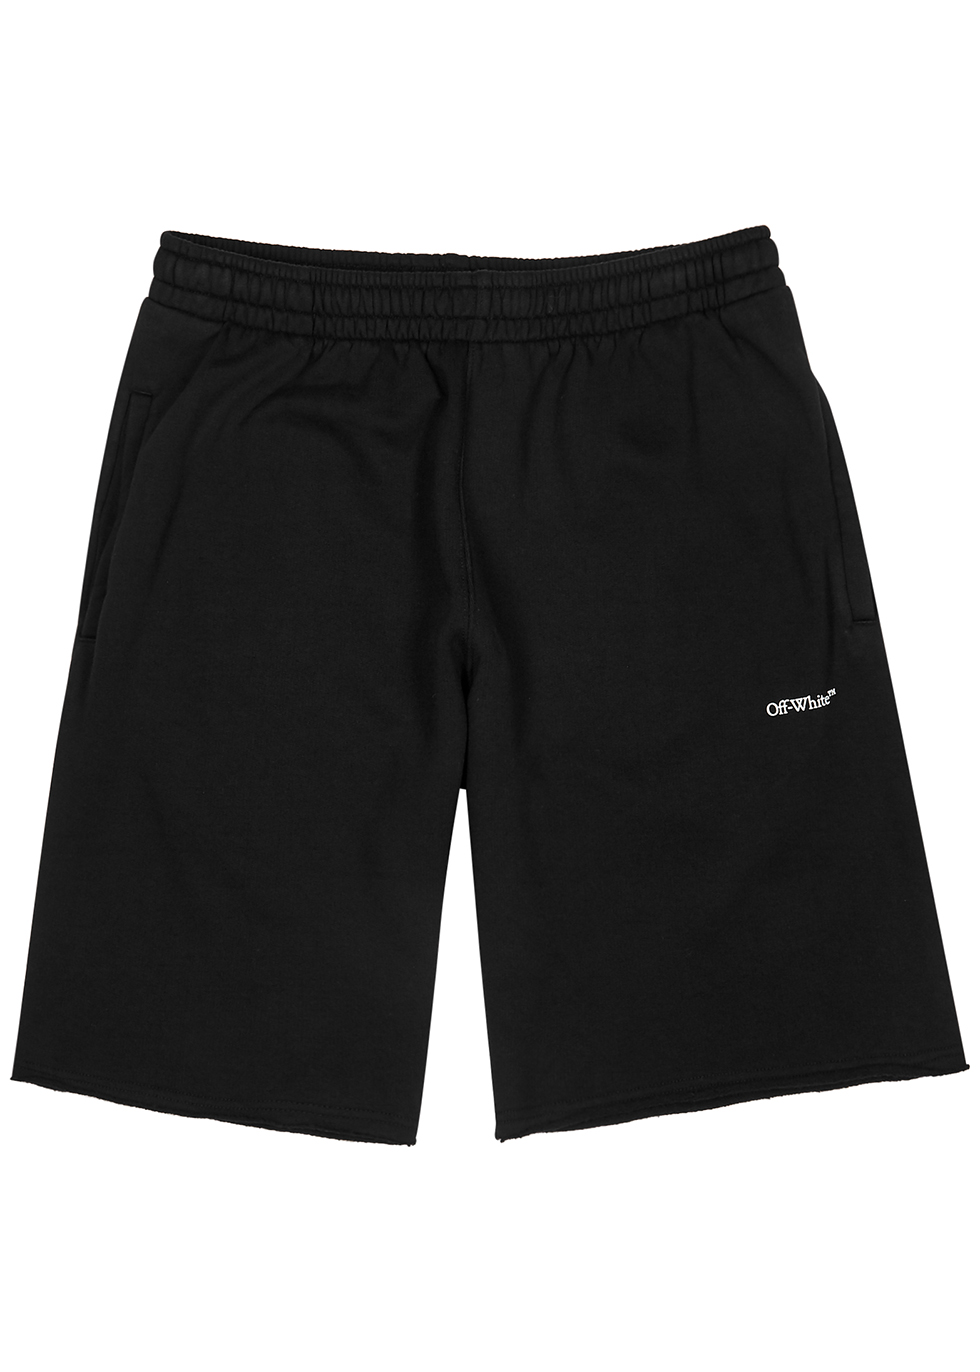 Stencil black cotton shorts